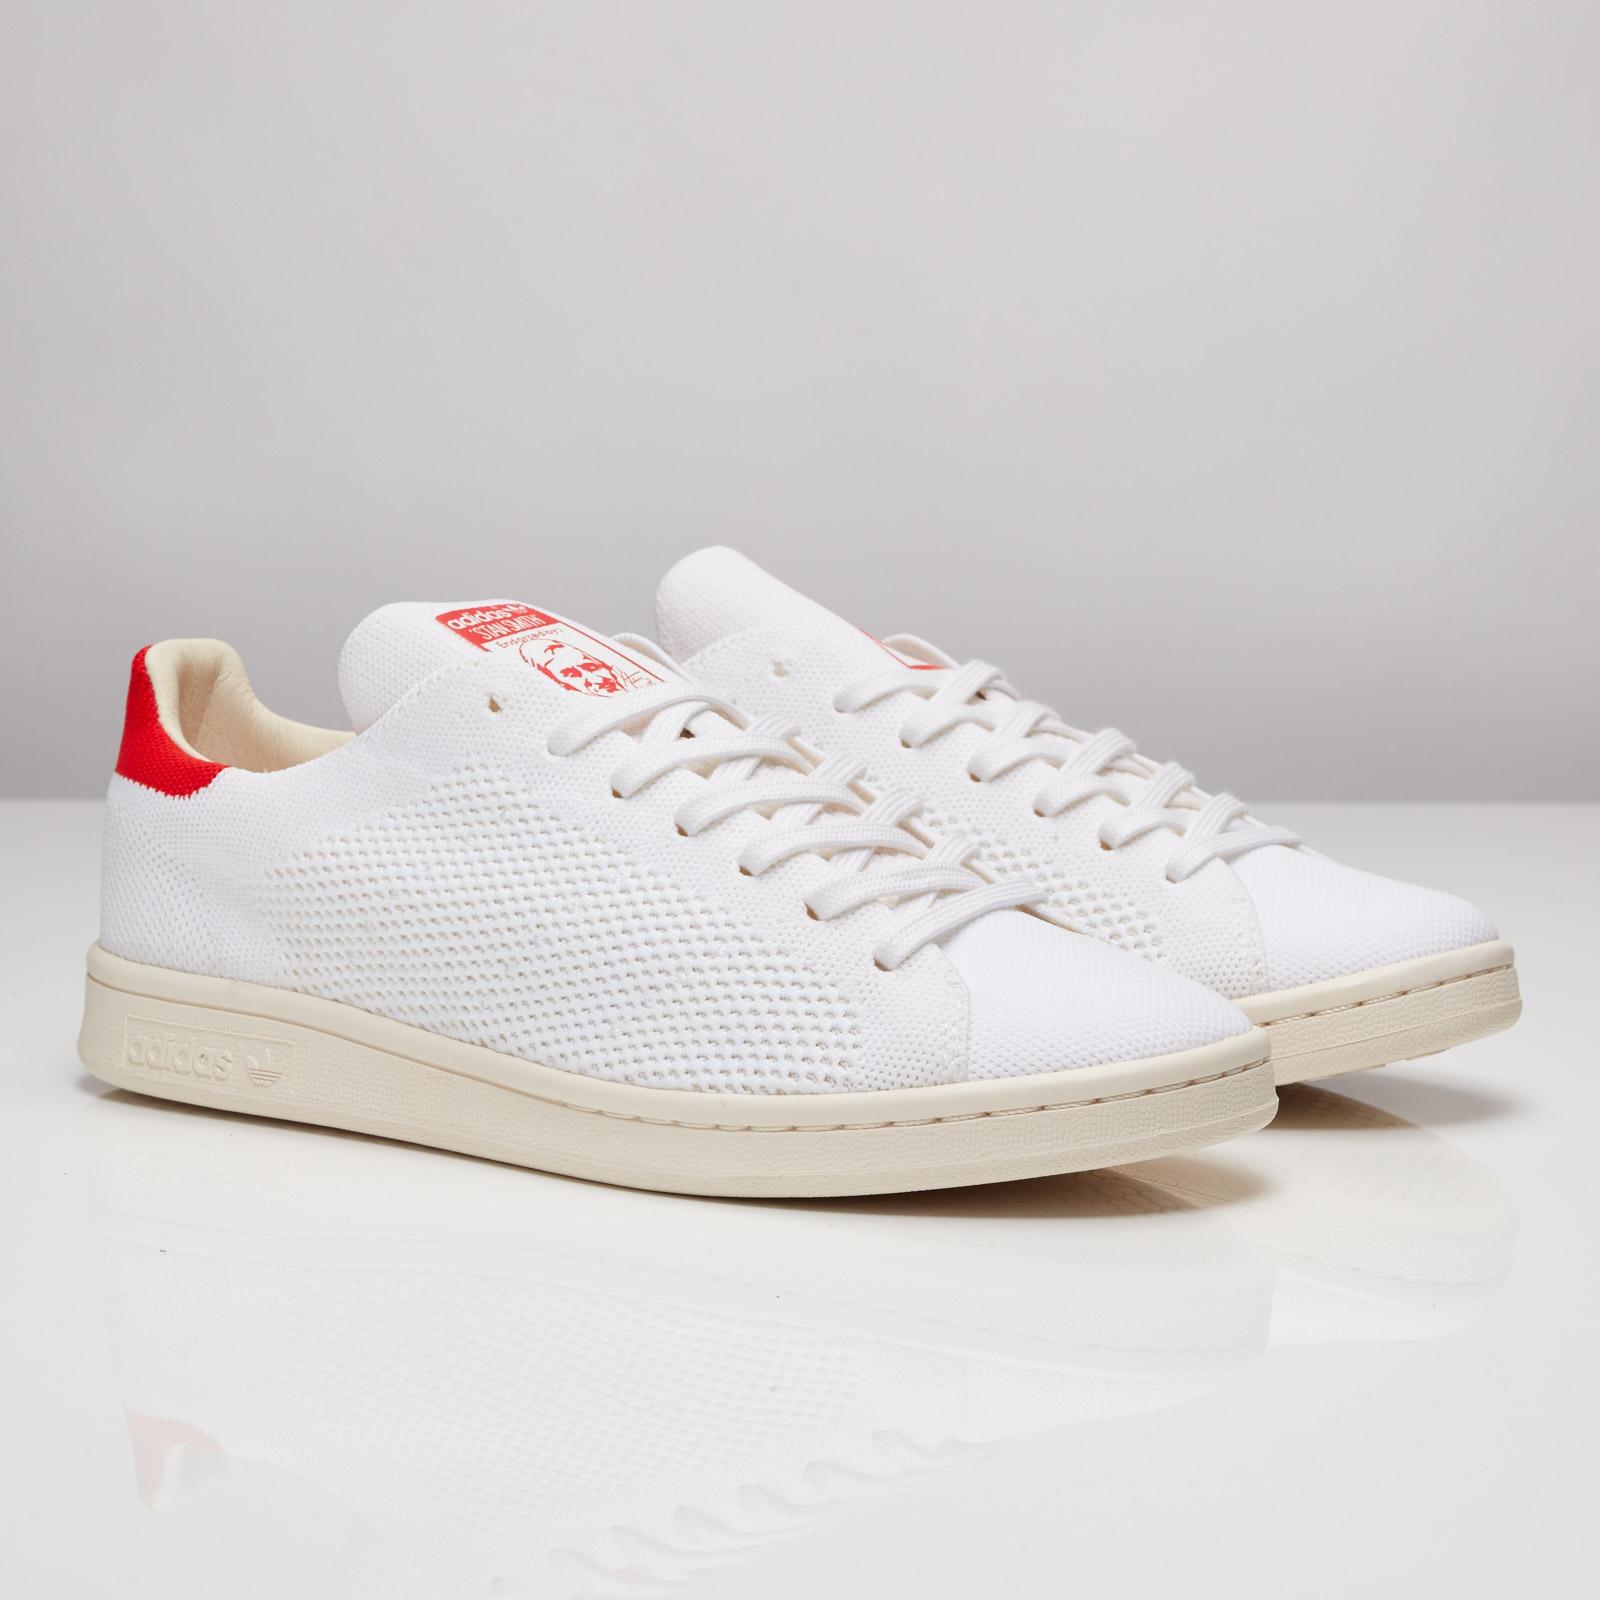 Adidas Stan Smith Og Pk - S75147 aLs1v